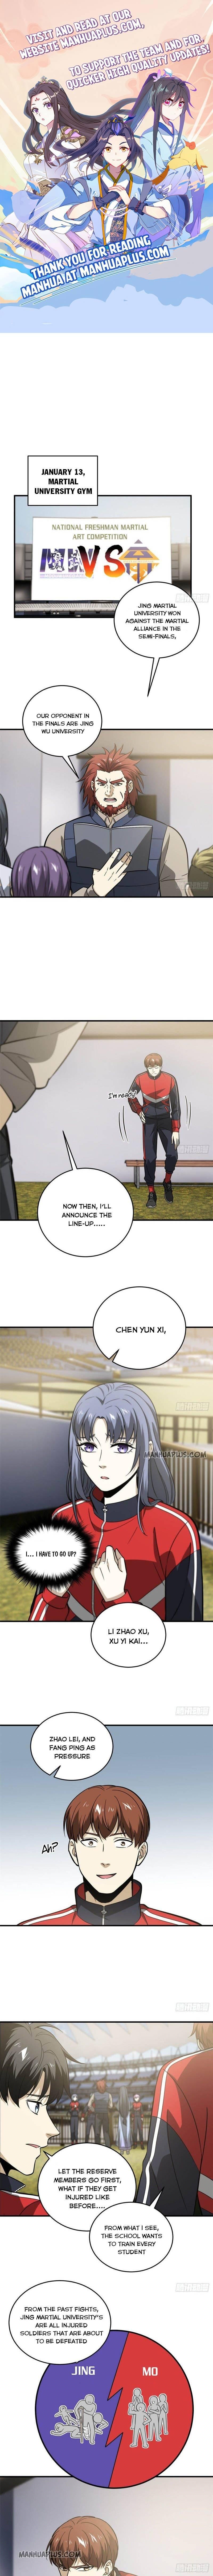 Manga Global Martial Arts - Chapter 84 Page 1